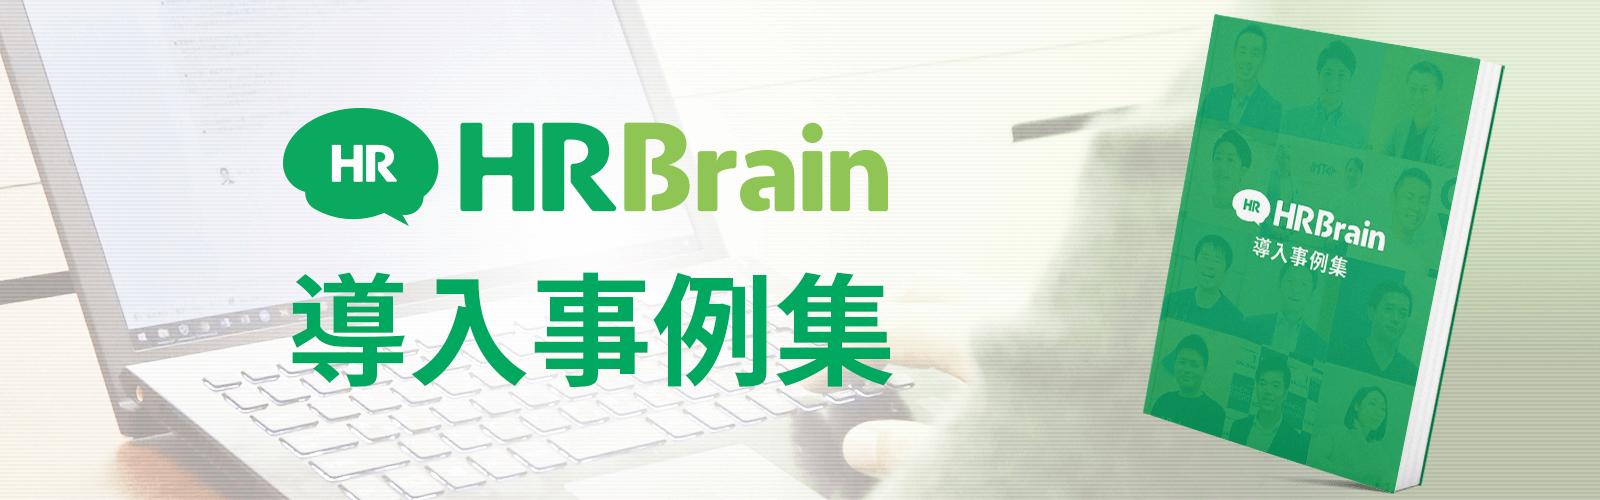 HRBrain導入事例集